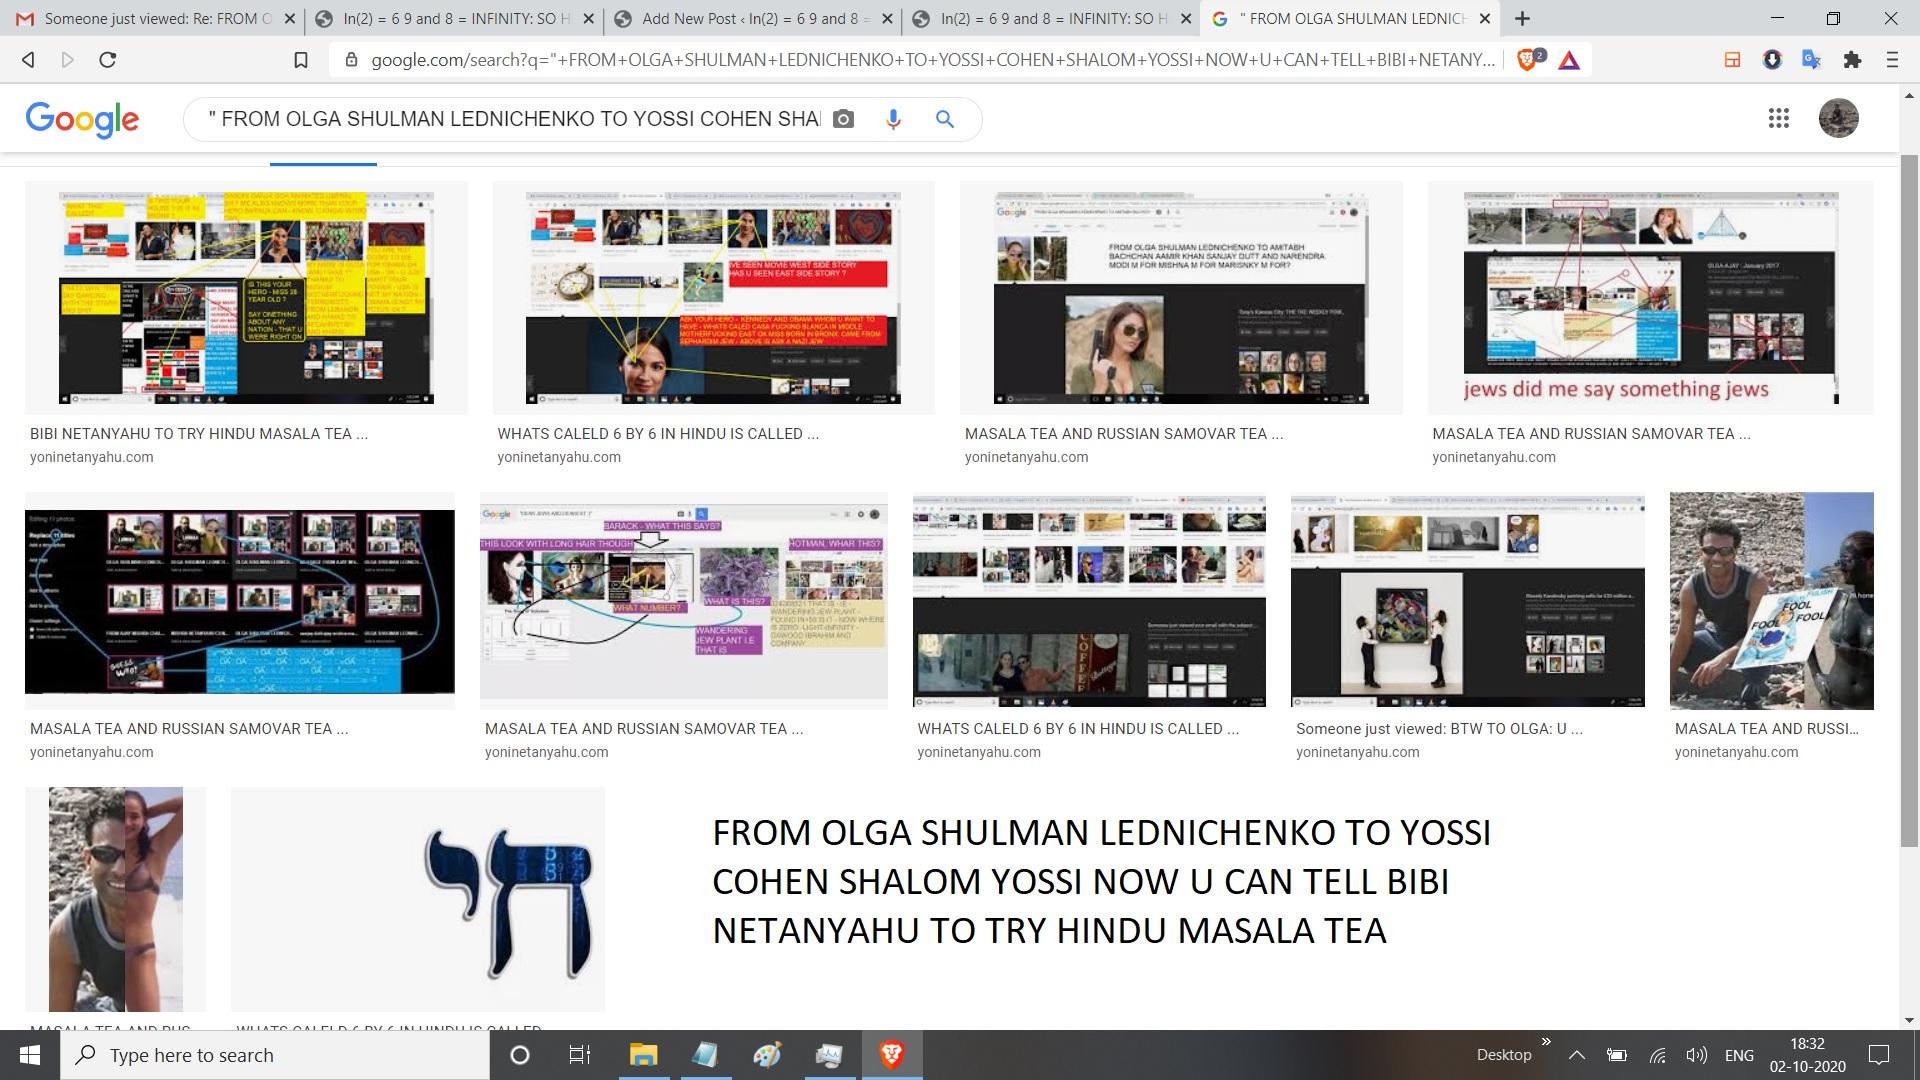 FROM OLGA SHULMAN LEDNICHENKO TO YOSSI COHEN SHALOM YOSSI NOW U CAN TELL BIBI NETANYAHU TO TRY HINDU MASALA TEA